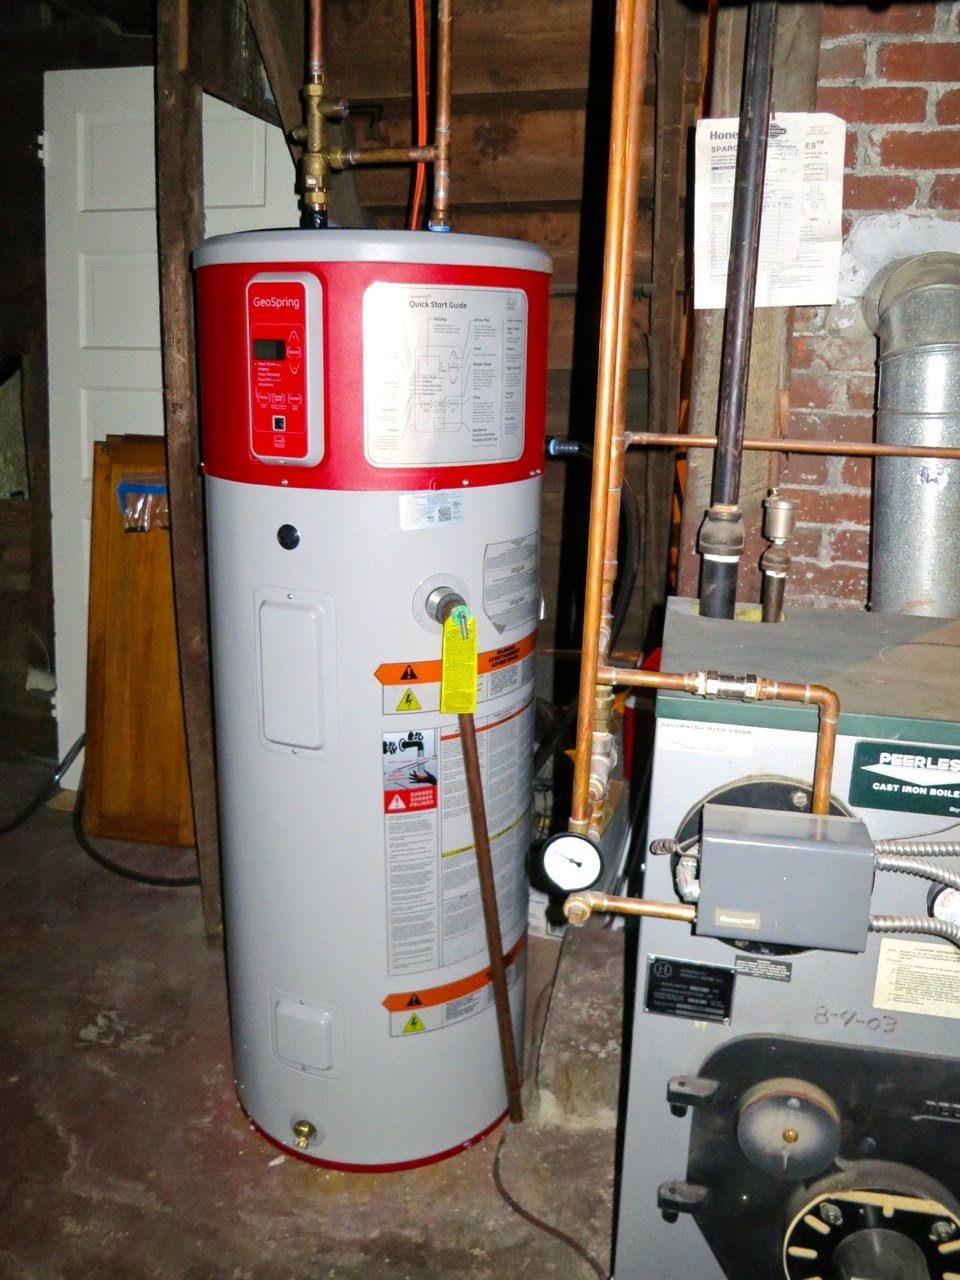 Hot Water Heater Wiring Diagram 2002 Vw Golf Radio Caleb